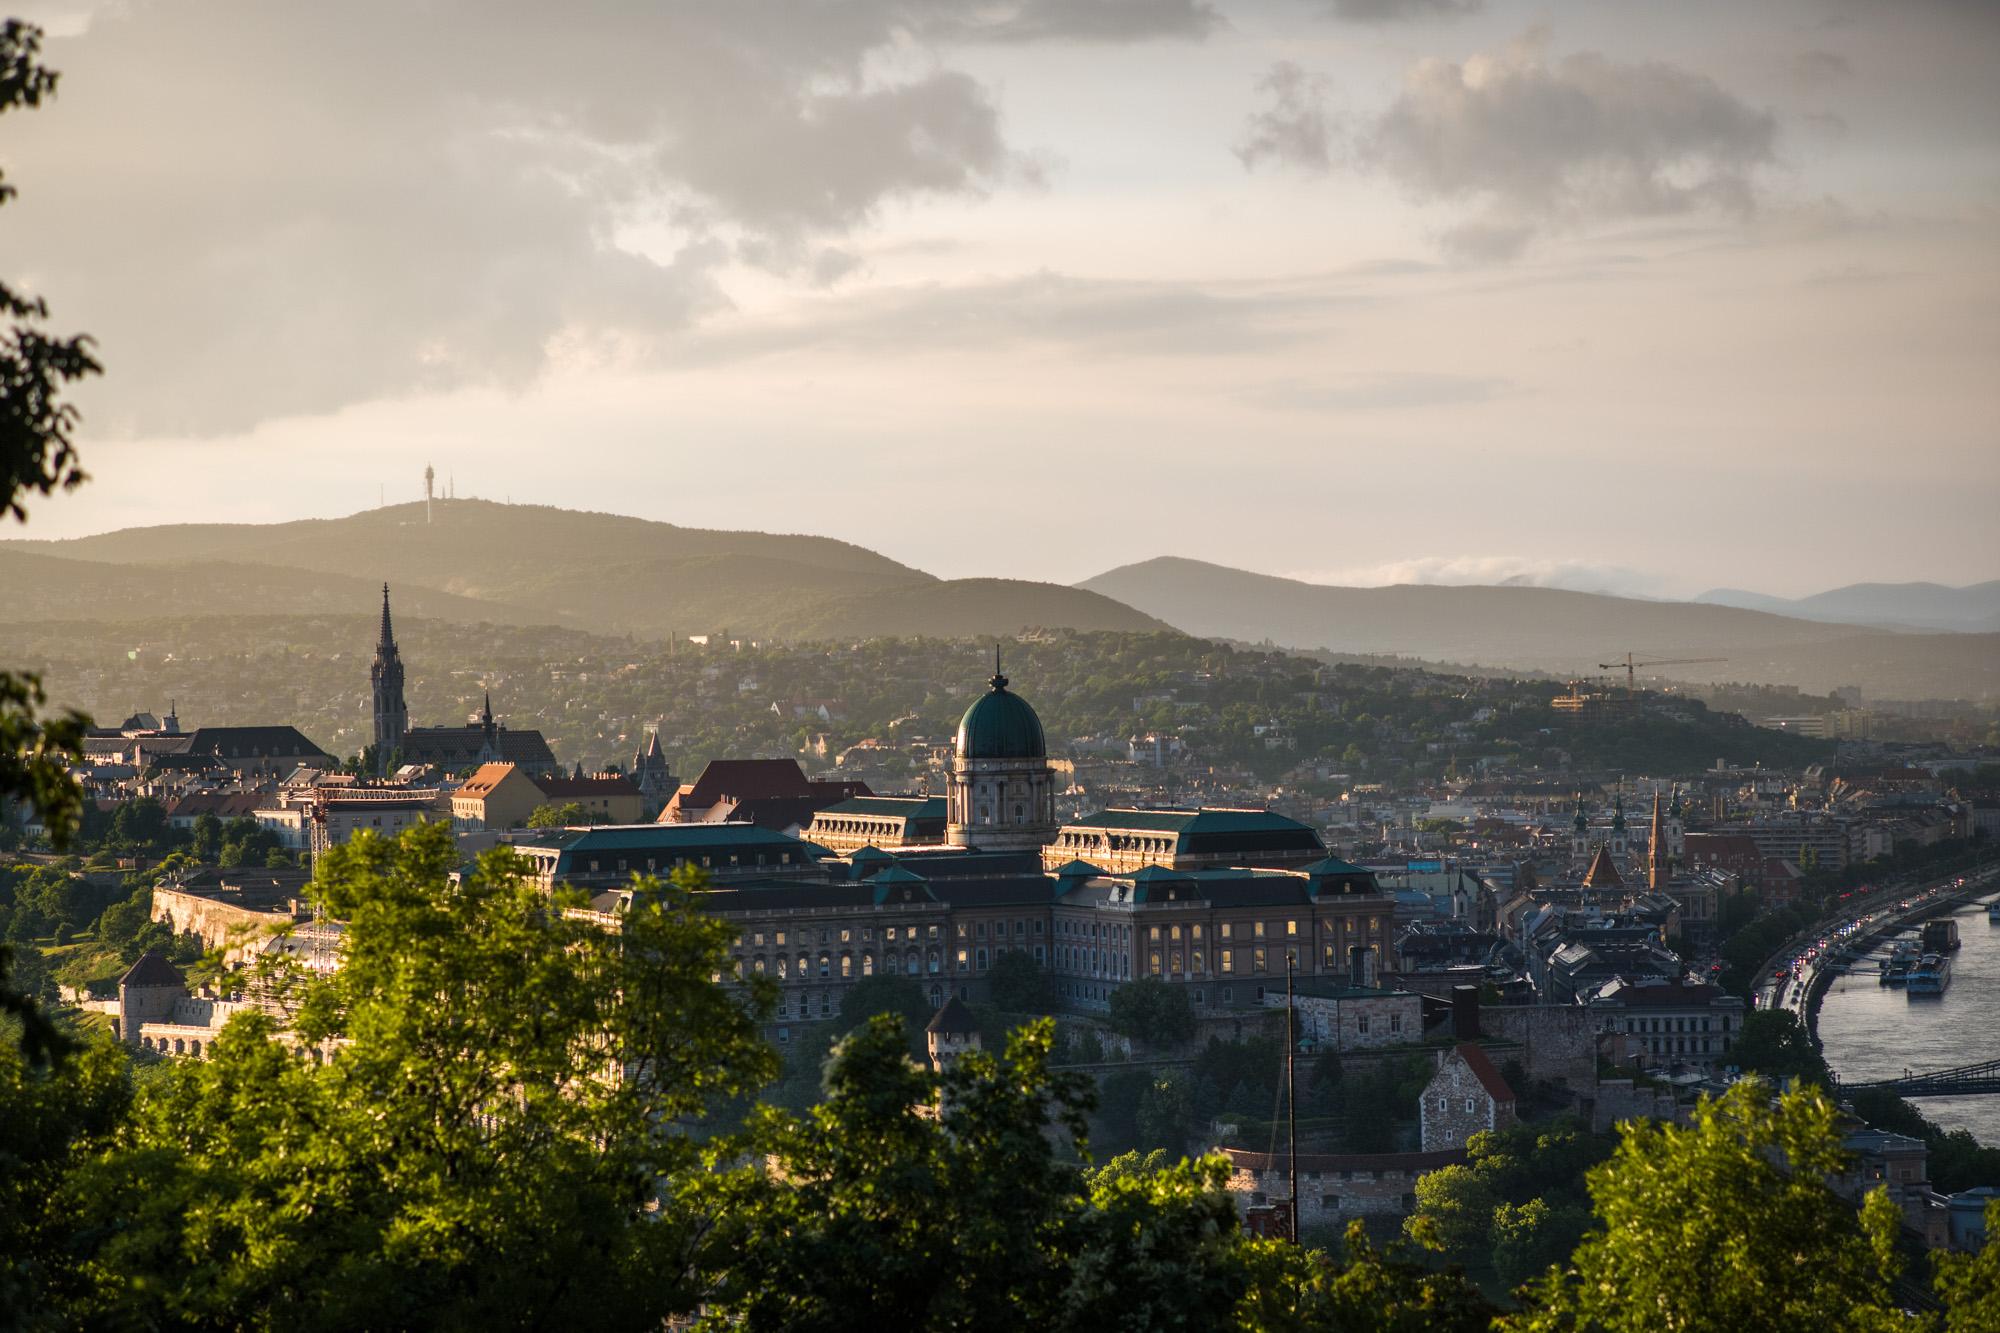 View of Castle from Gellért Hill